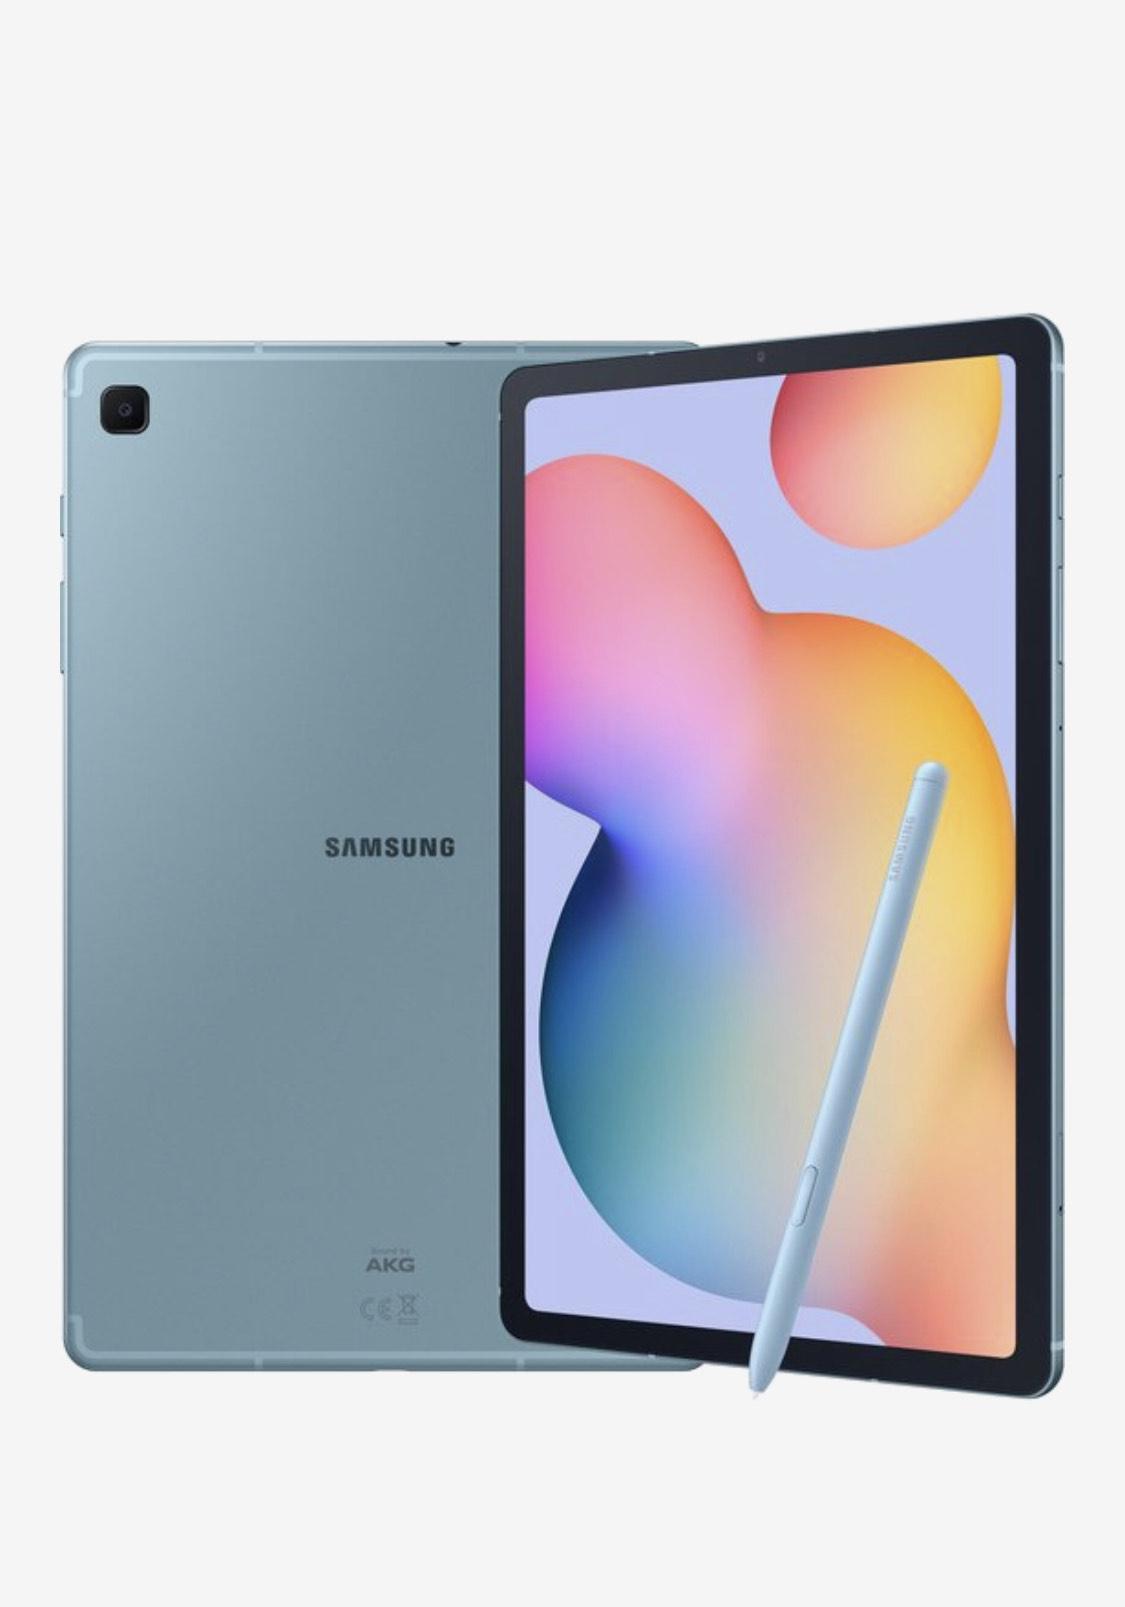 Gratis galaxy buds bij Samsung Galaxy Tab S6 Lite - 64GB - Blauw